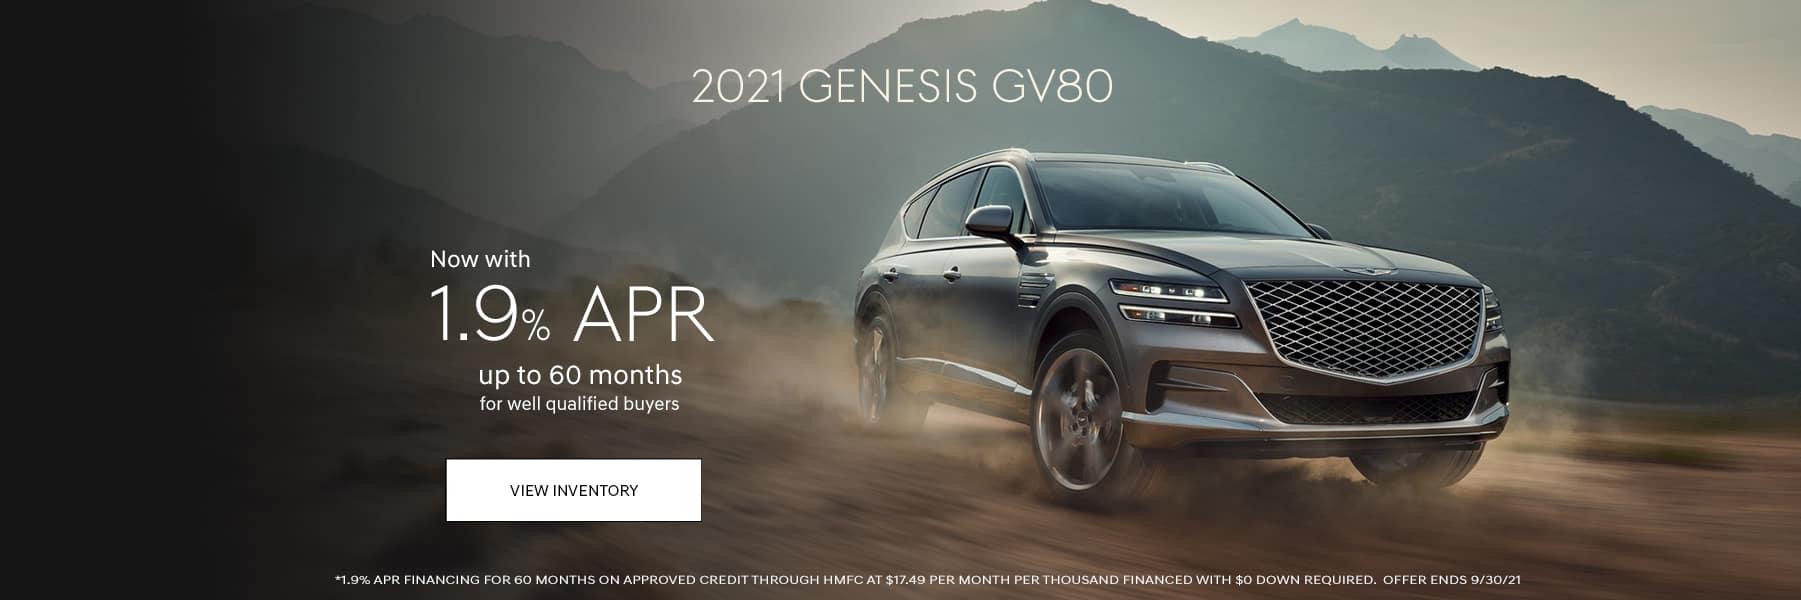 2021-Genesis-GV80-Sep21